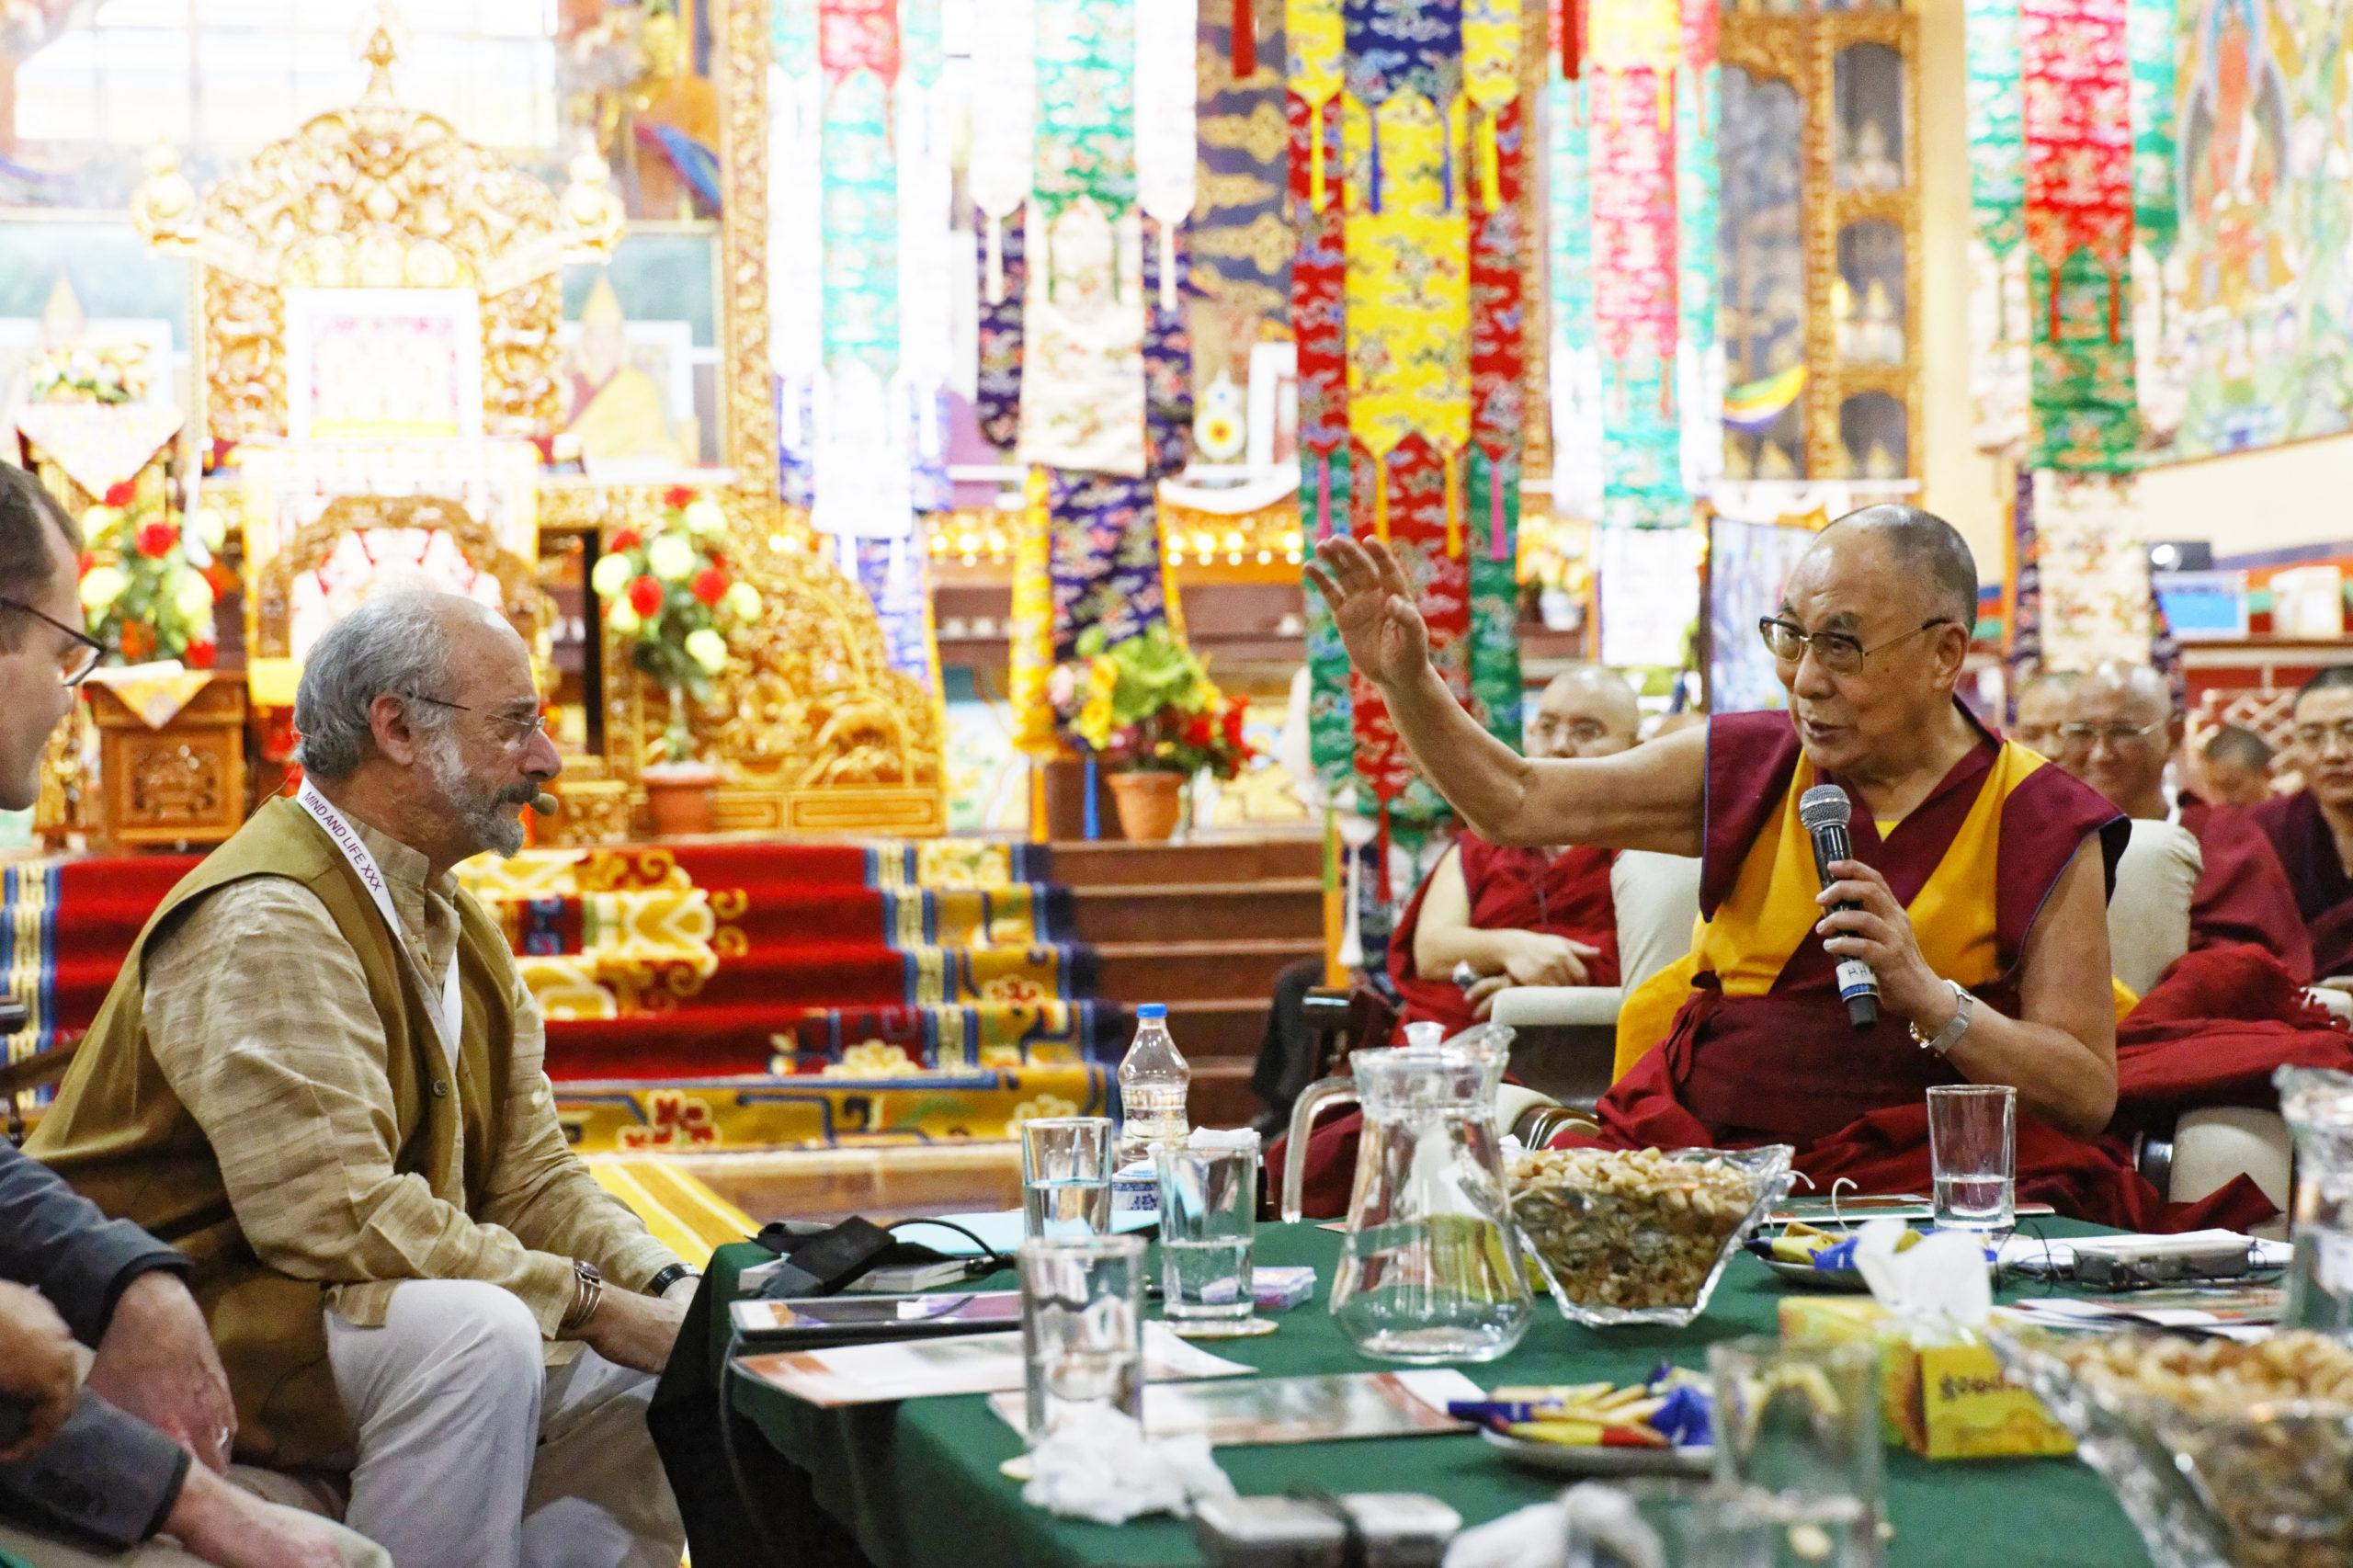 Dalai lama online course Buddhism science Wisdom Academy Mind & Life